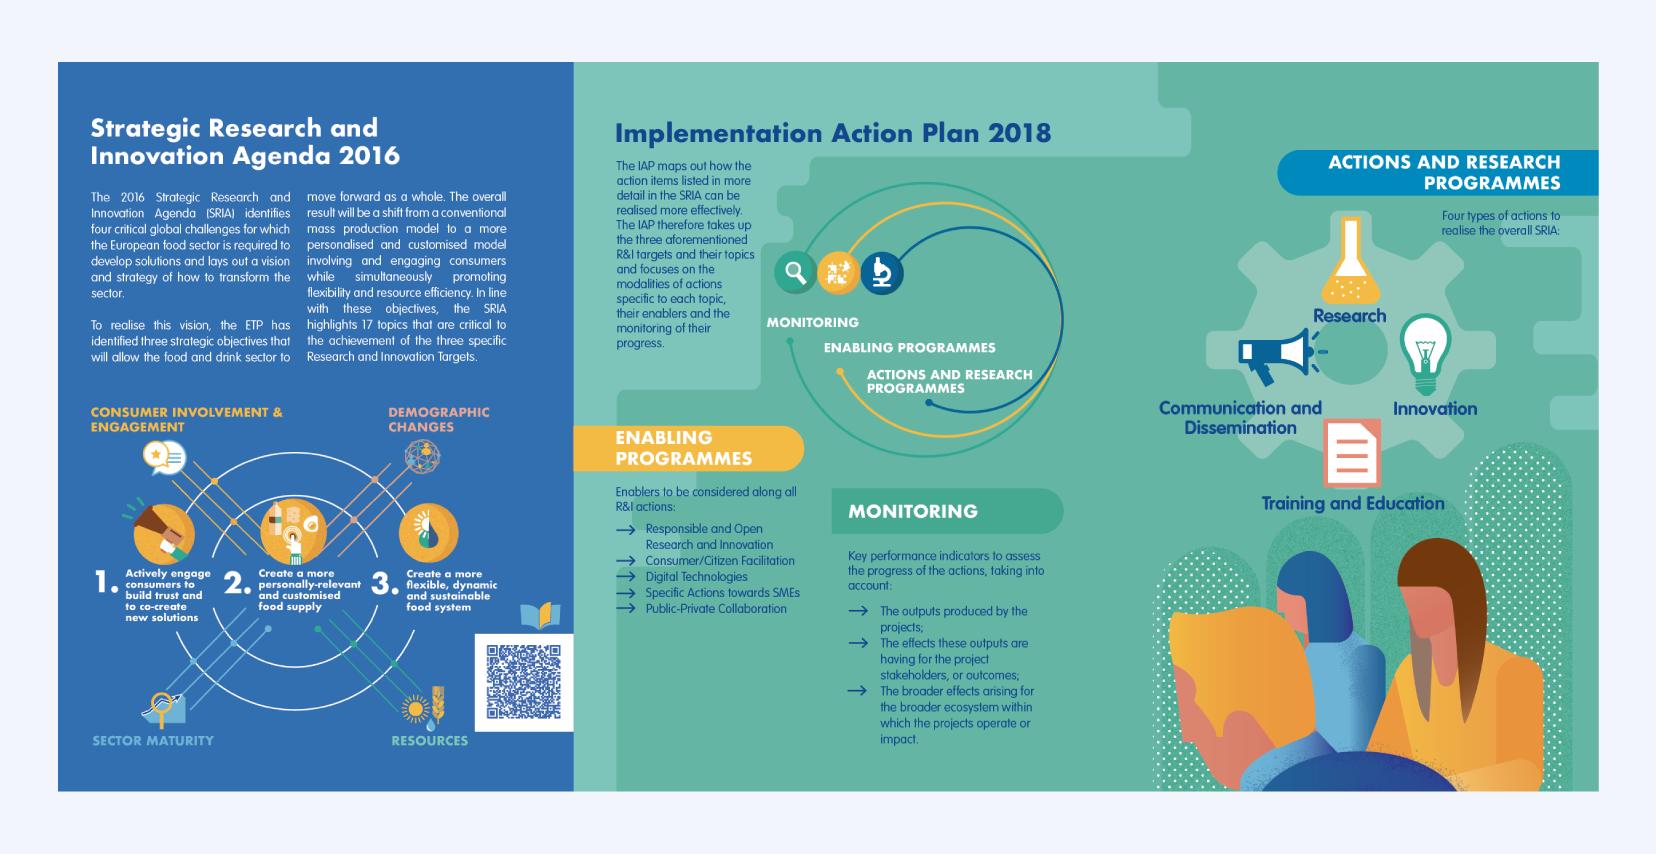 ETP_Implementation_Action_Plan_2018_Brochure_Agenda